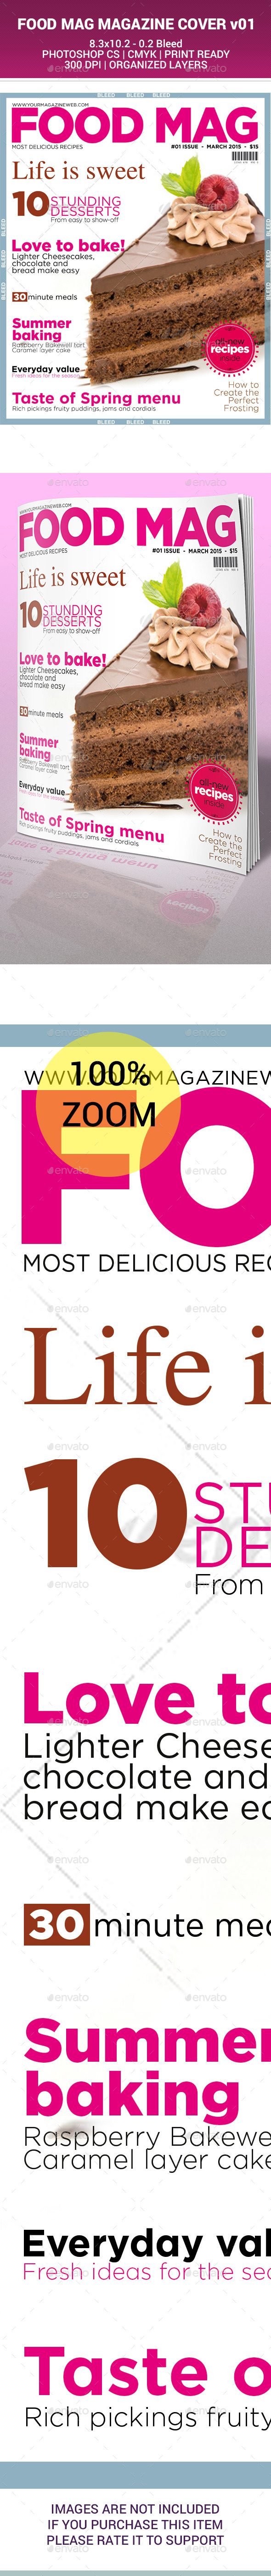 FOOD MAG - MAGAZINE COVER DESIGN v01 - Magazines Print Templates